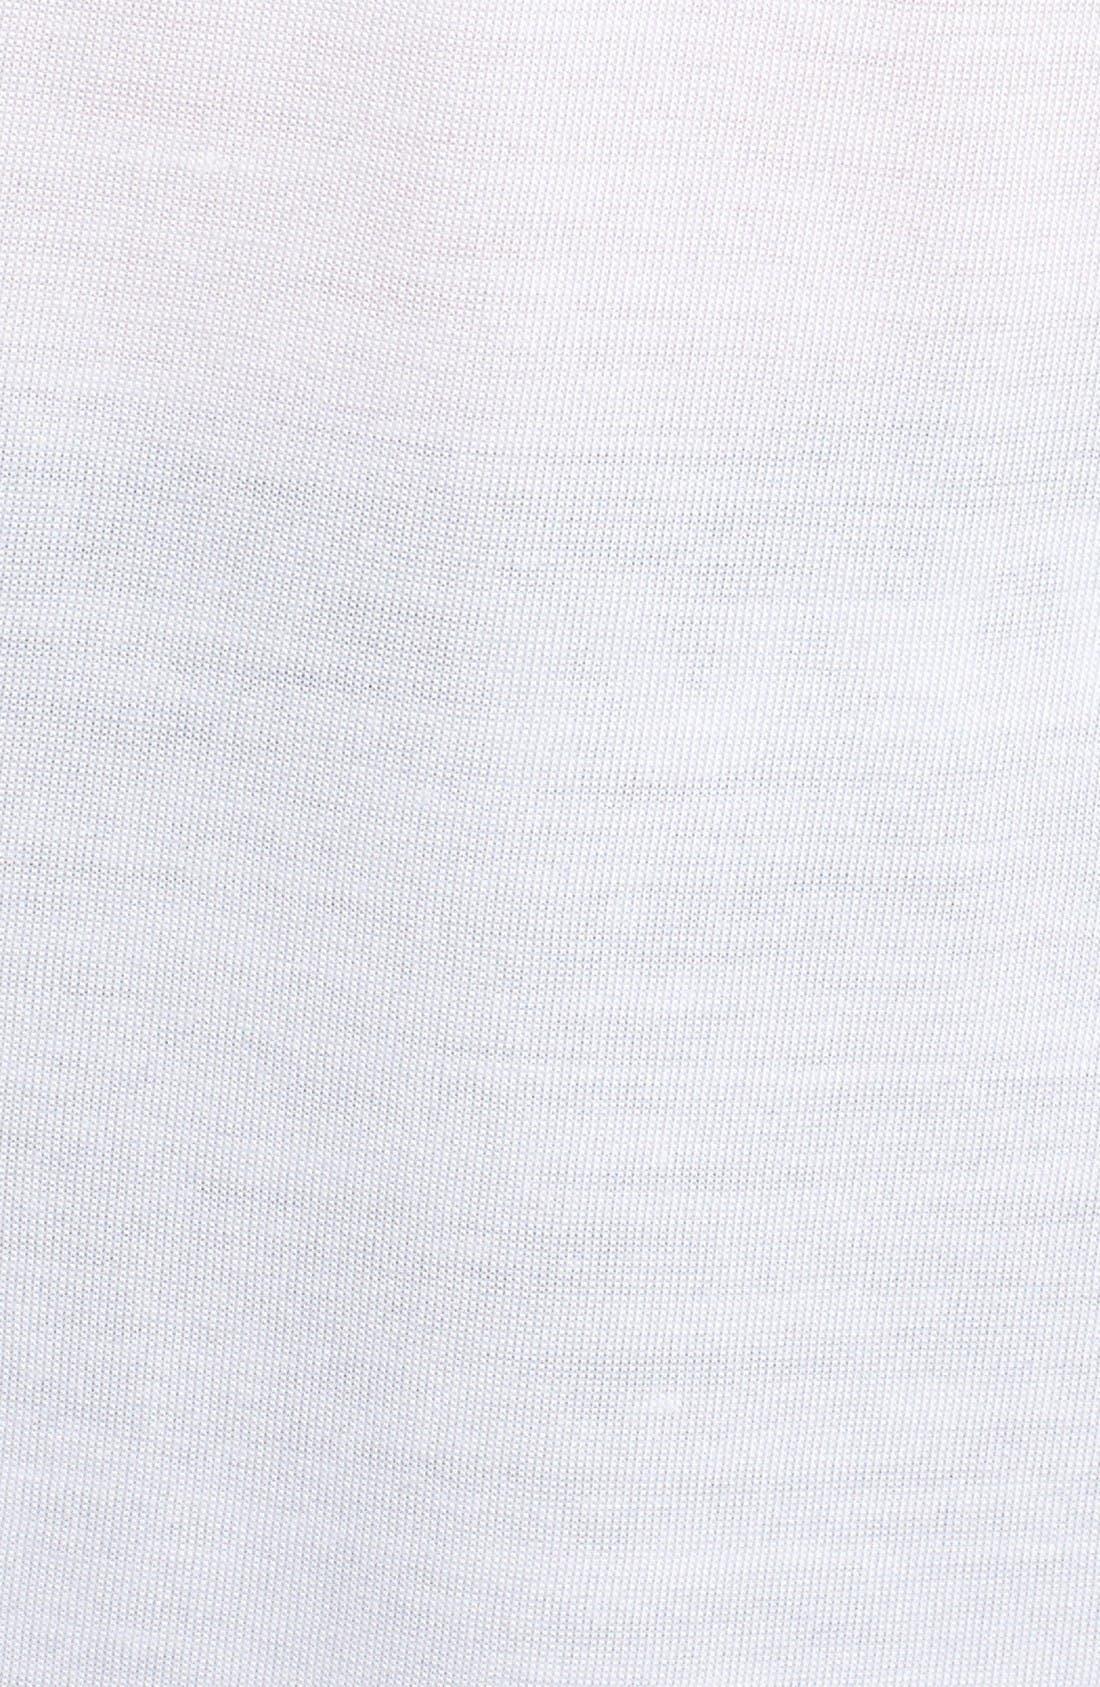 Logo Tank,                             Alternate thumbnail 7, color,                             White